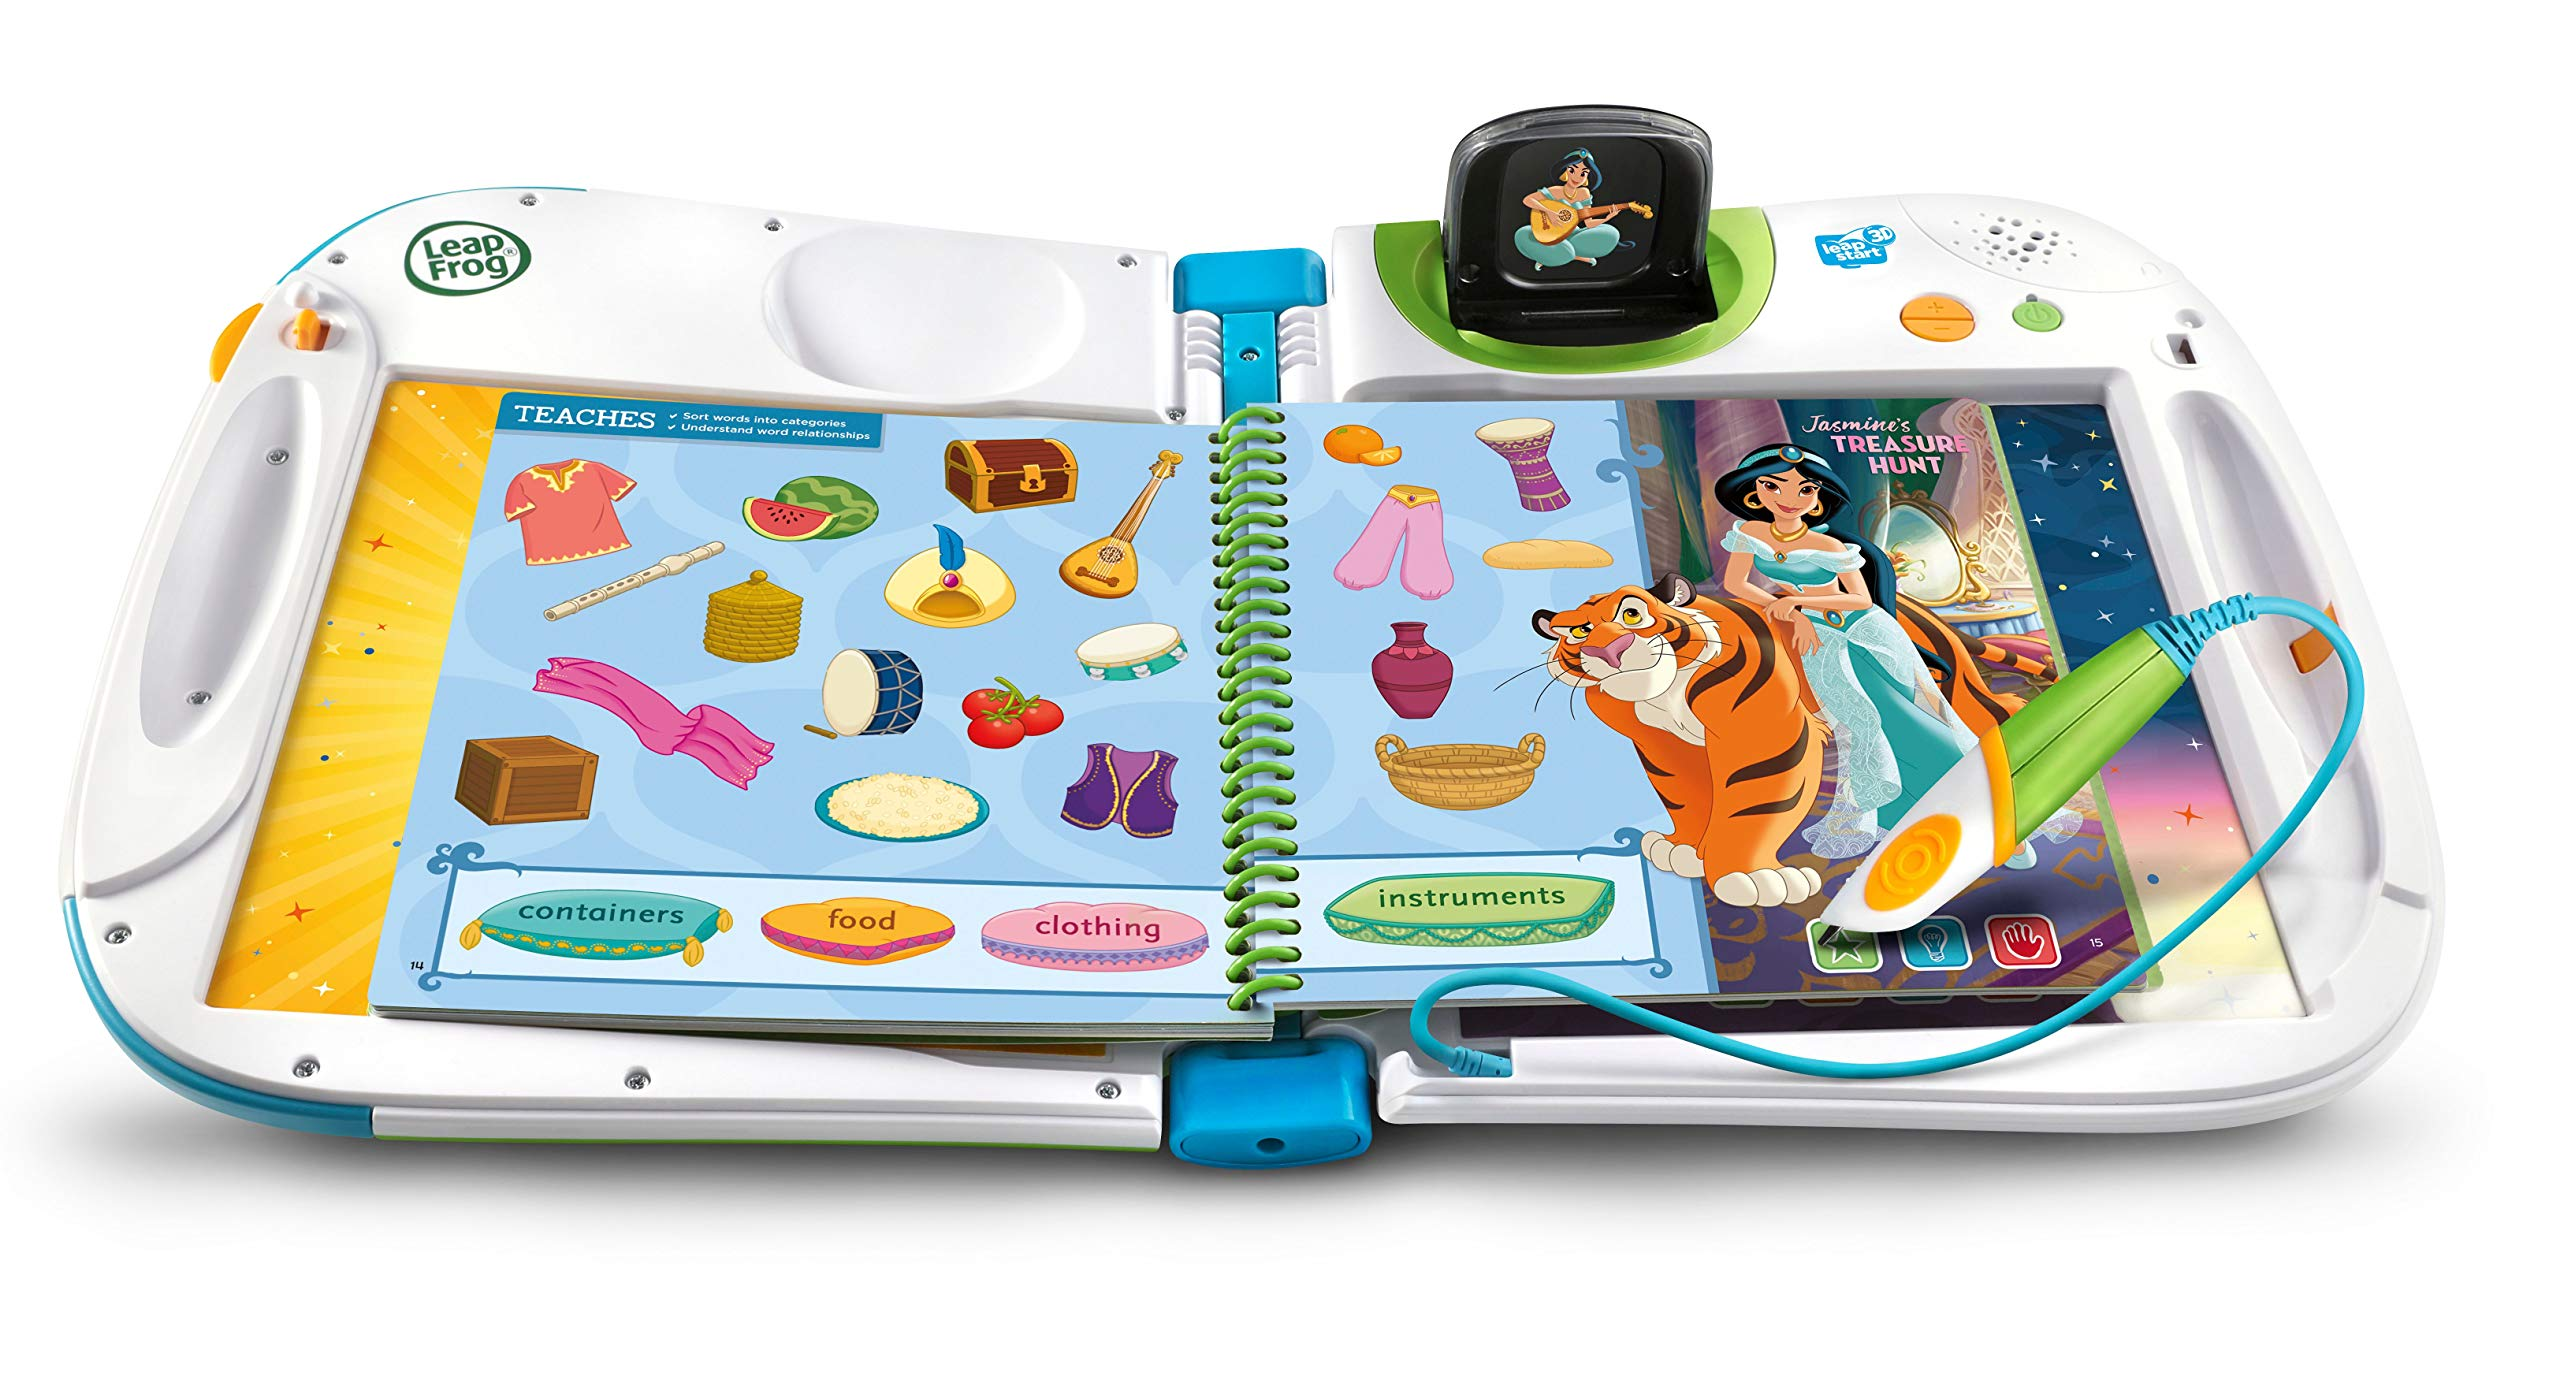 Leapstart Preschool: Disney Princess Shine with Vocabulary Activity Book (3D Enhanced) by LeapFrog (Image #5)